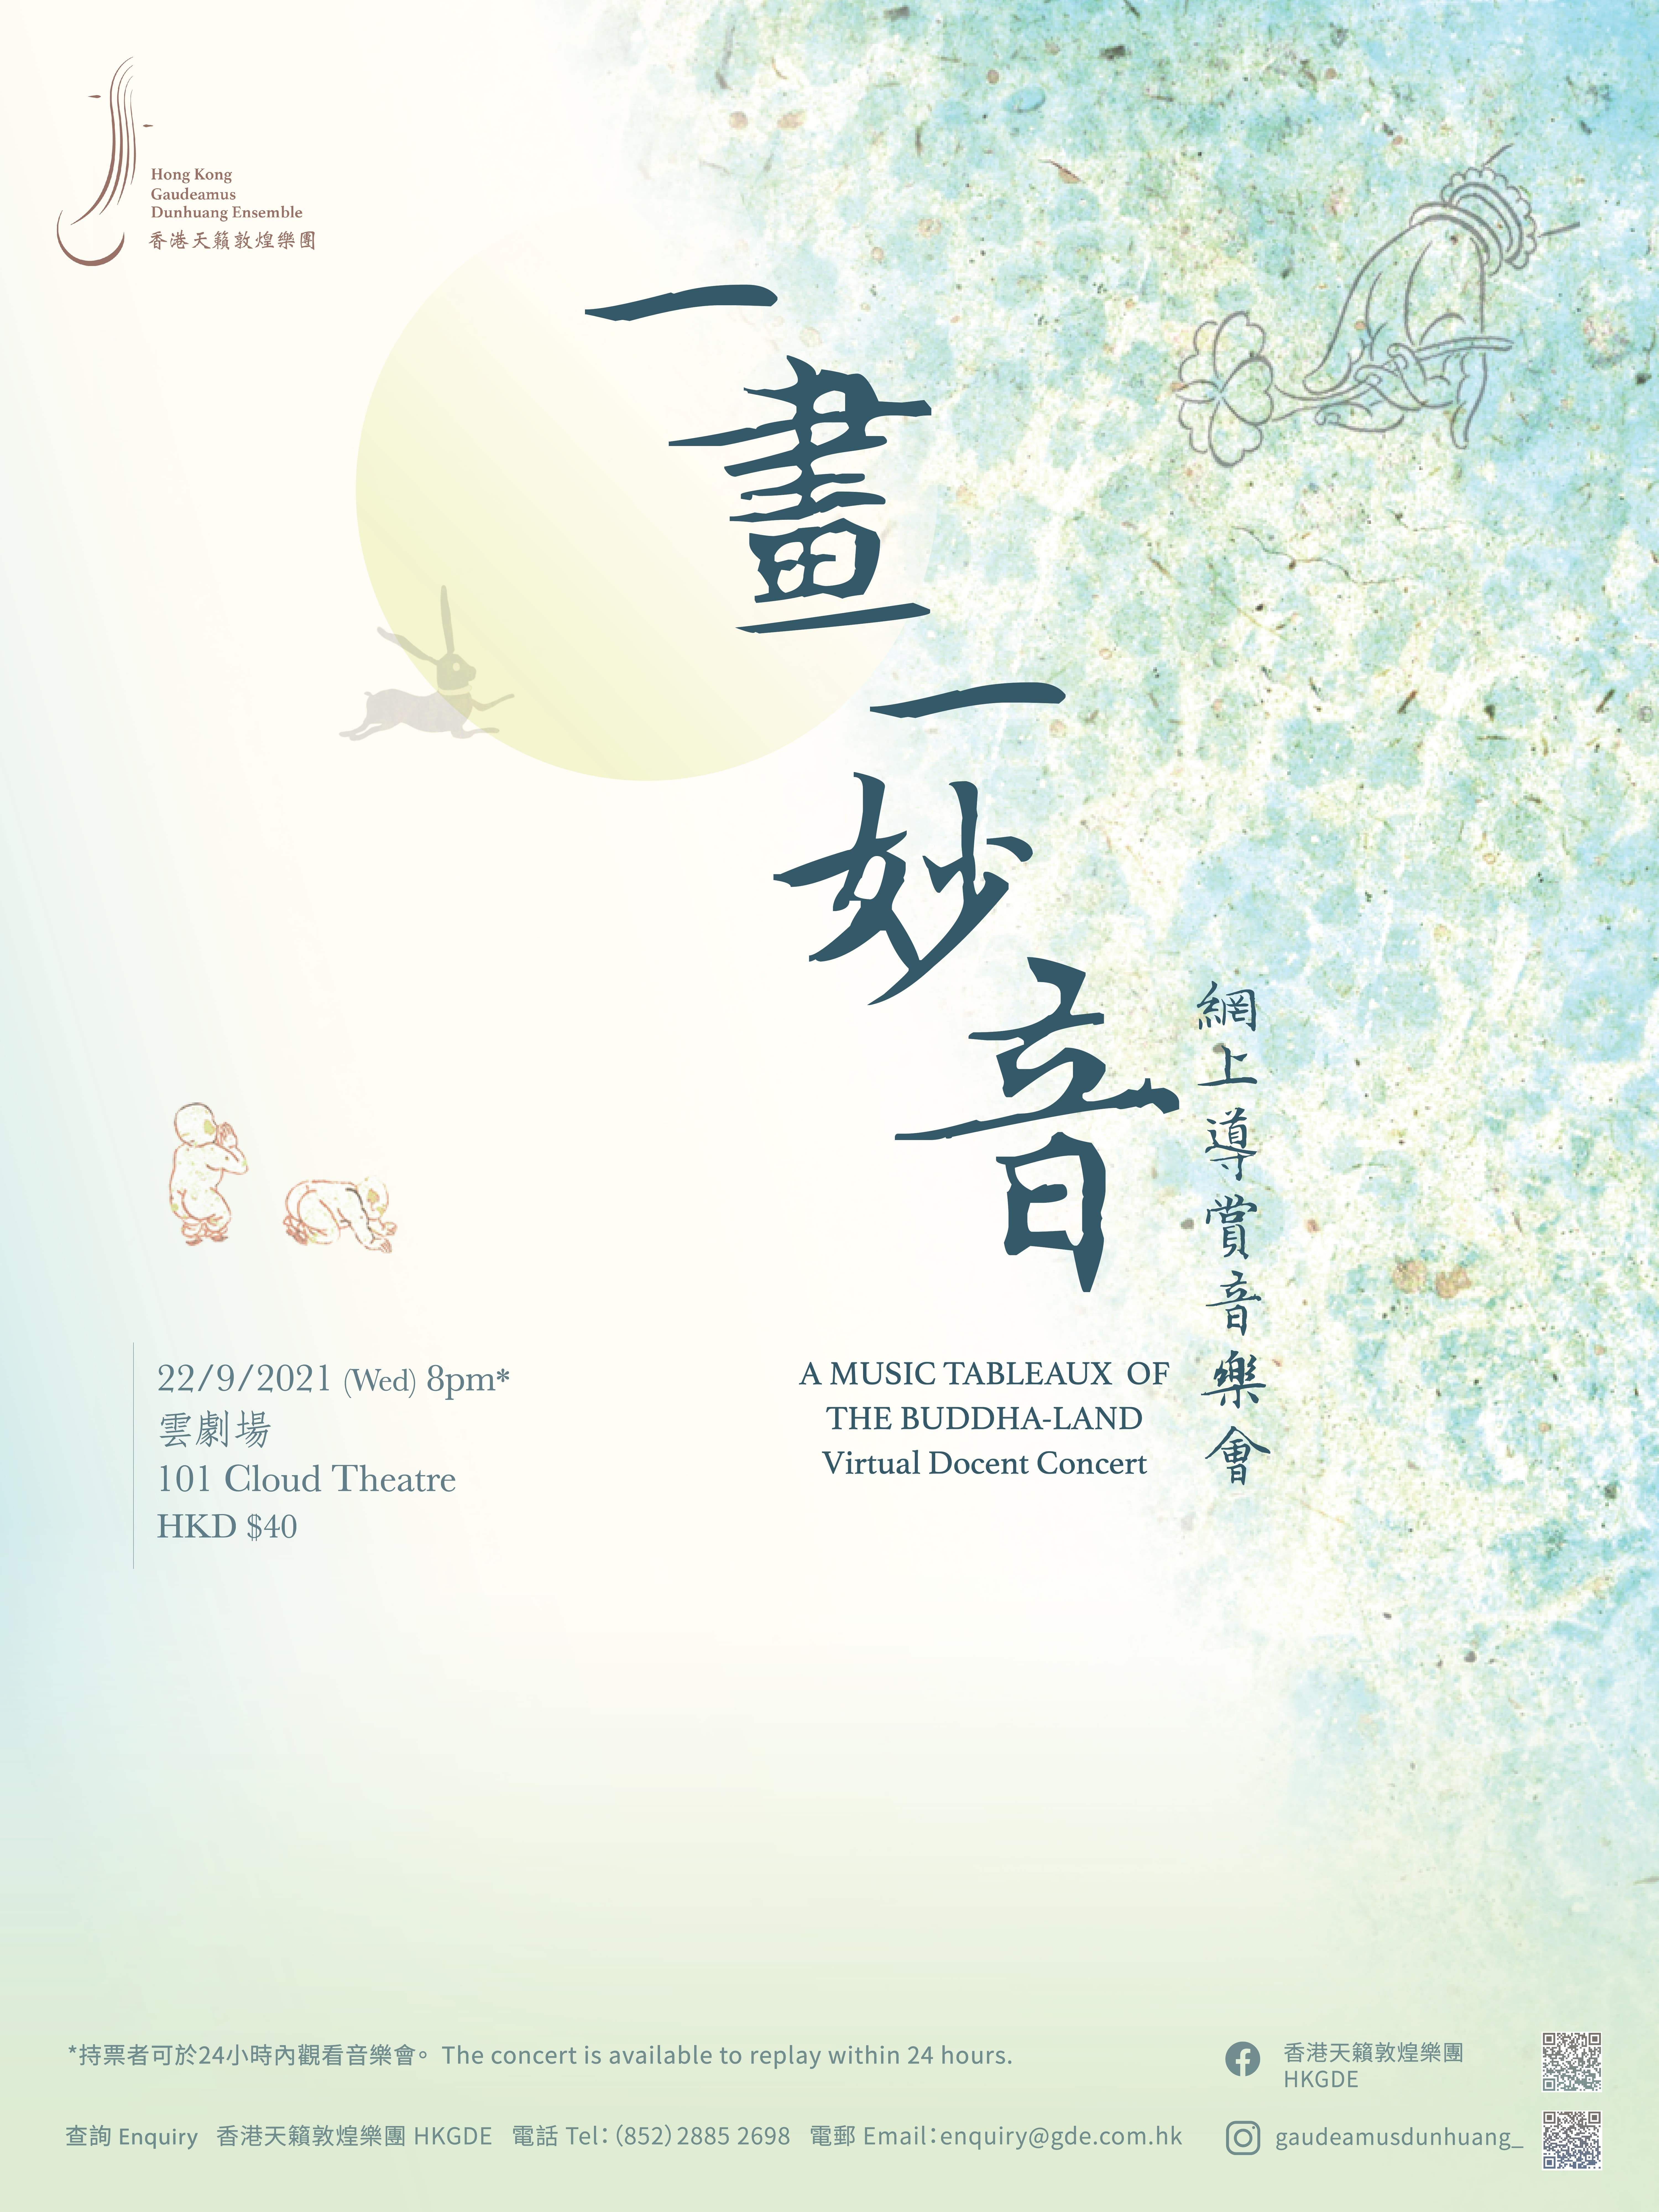 「一畫一妙音」網上導賞音樂會 A  Music Tableaux of the Buddhaland Virtual Docent Concert